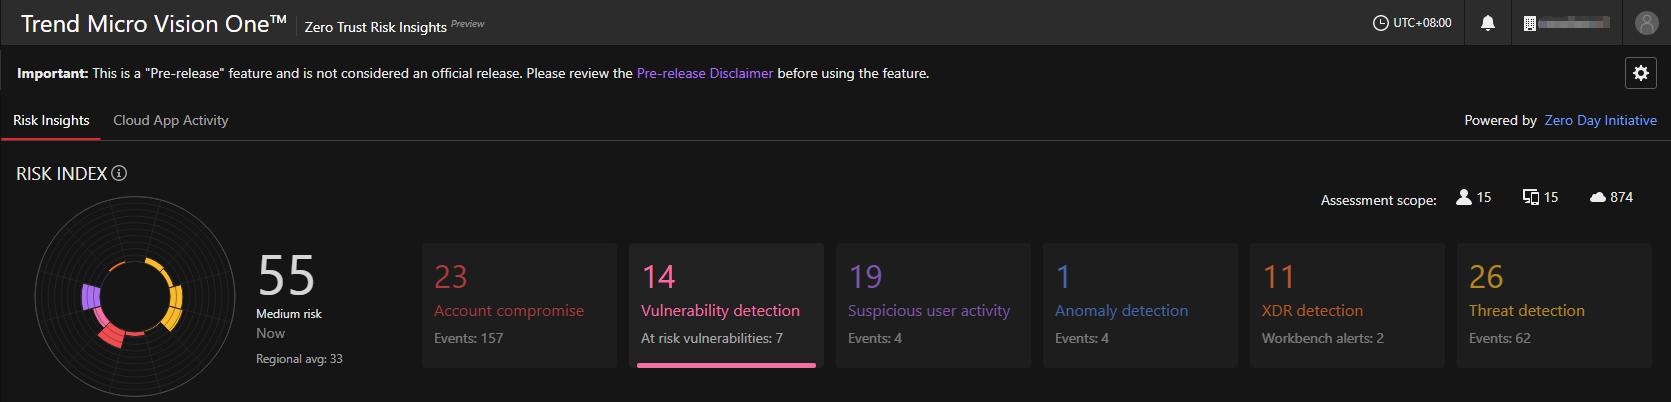 At Risk Vulnerabilities